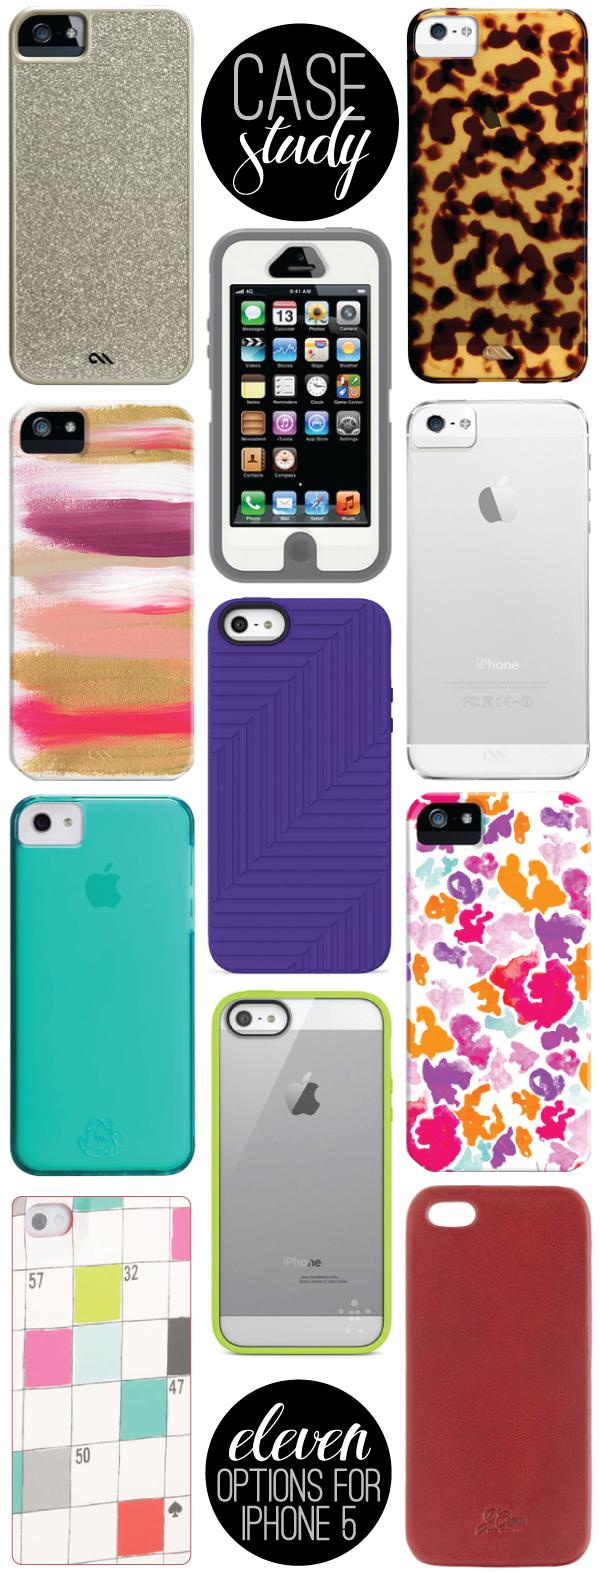 iphone case study